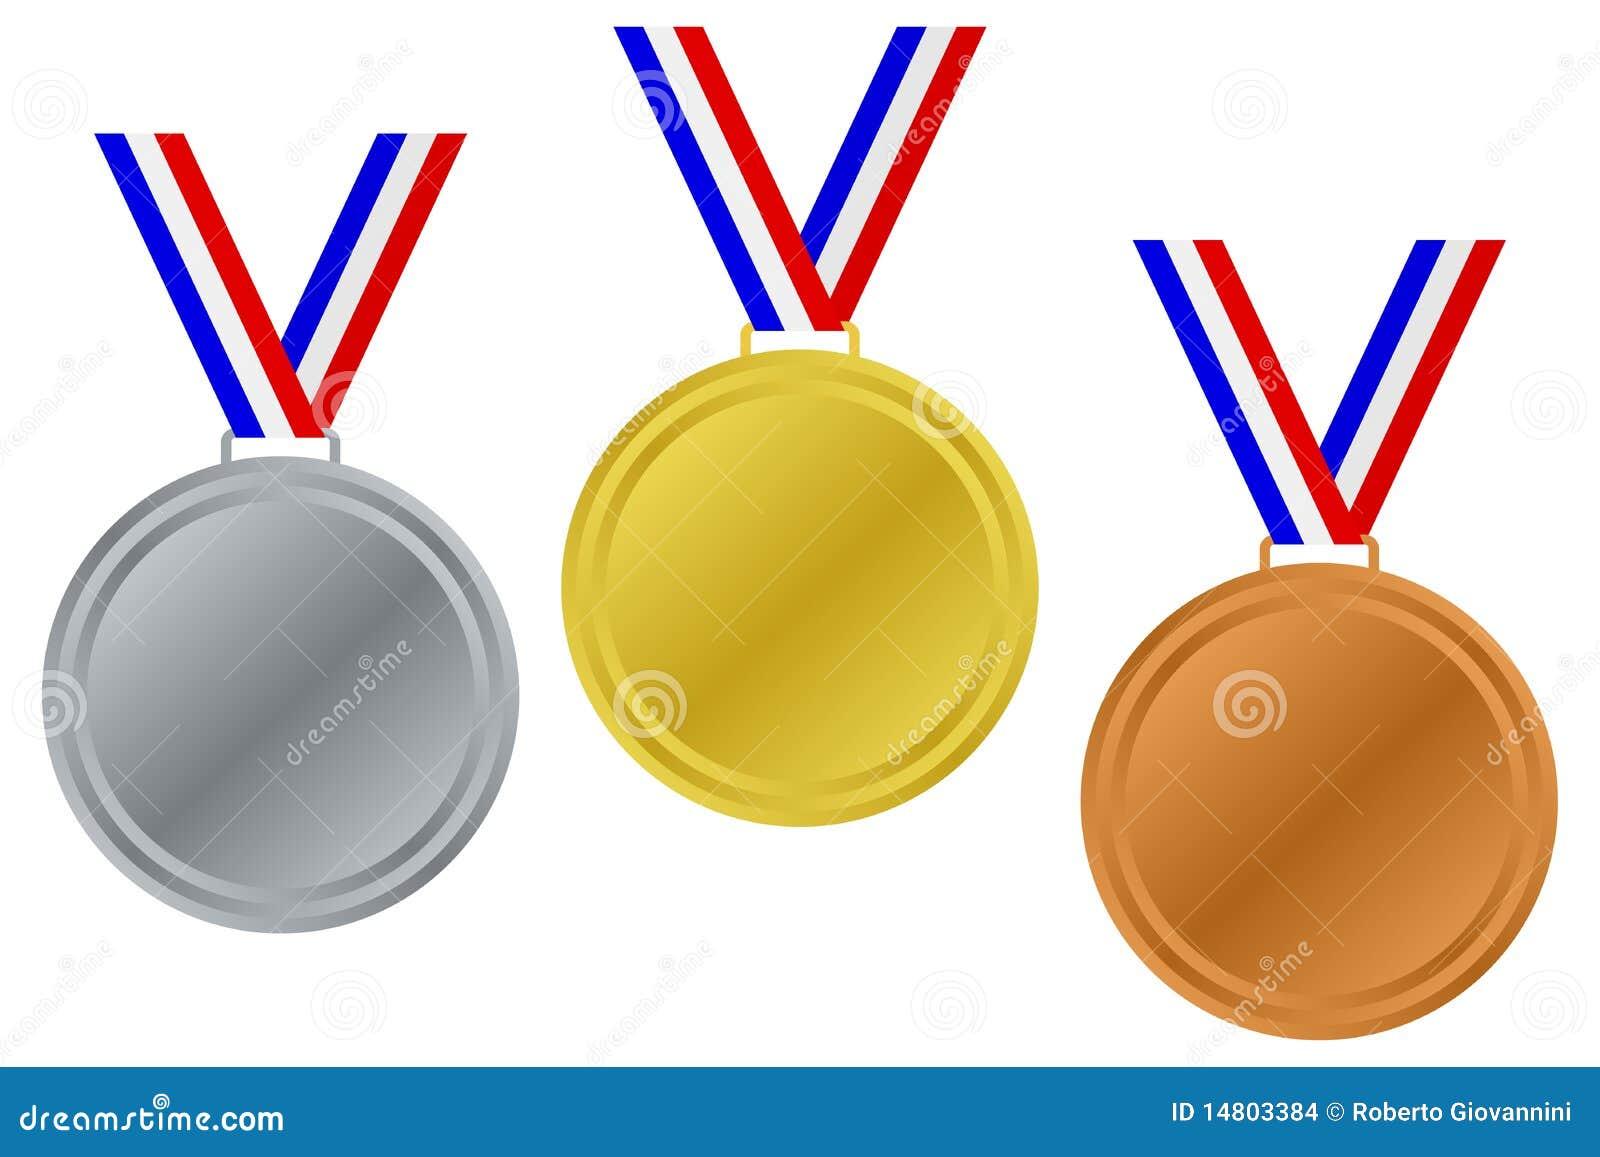 Blank Winner Medals Set